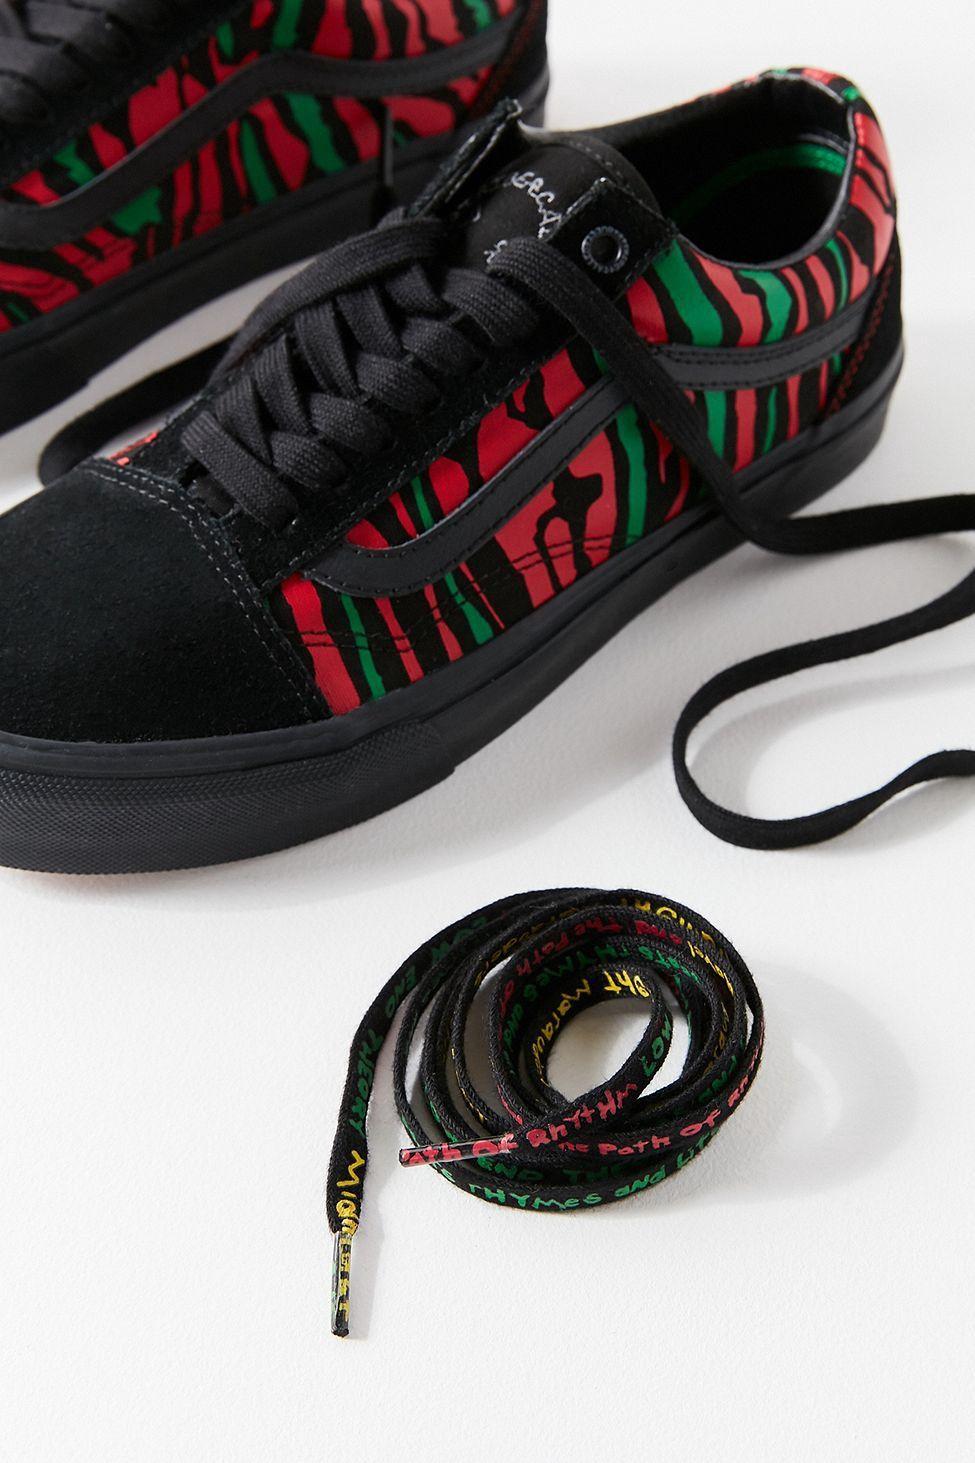 Vans X A Tribe Called Quest Old Skool Shoes | Black | Vans